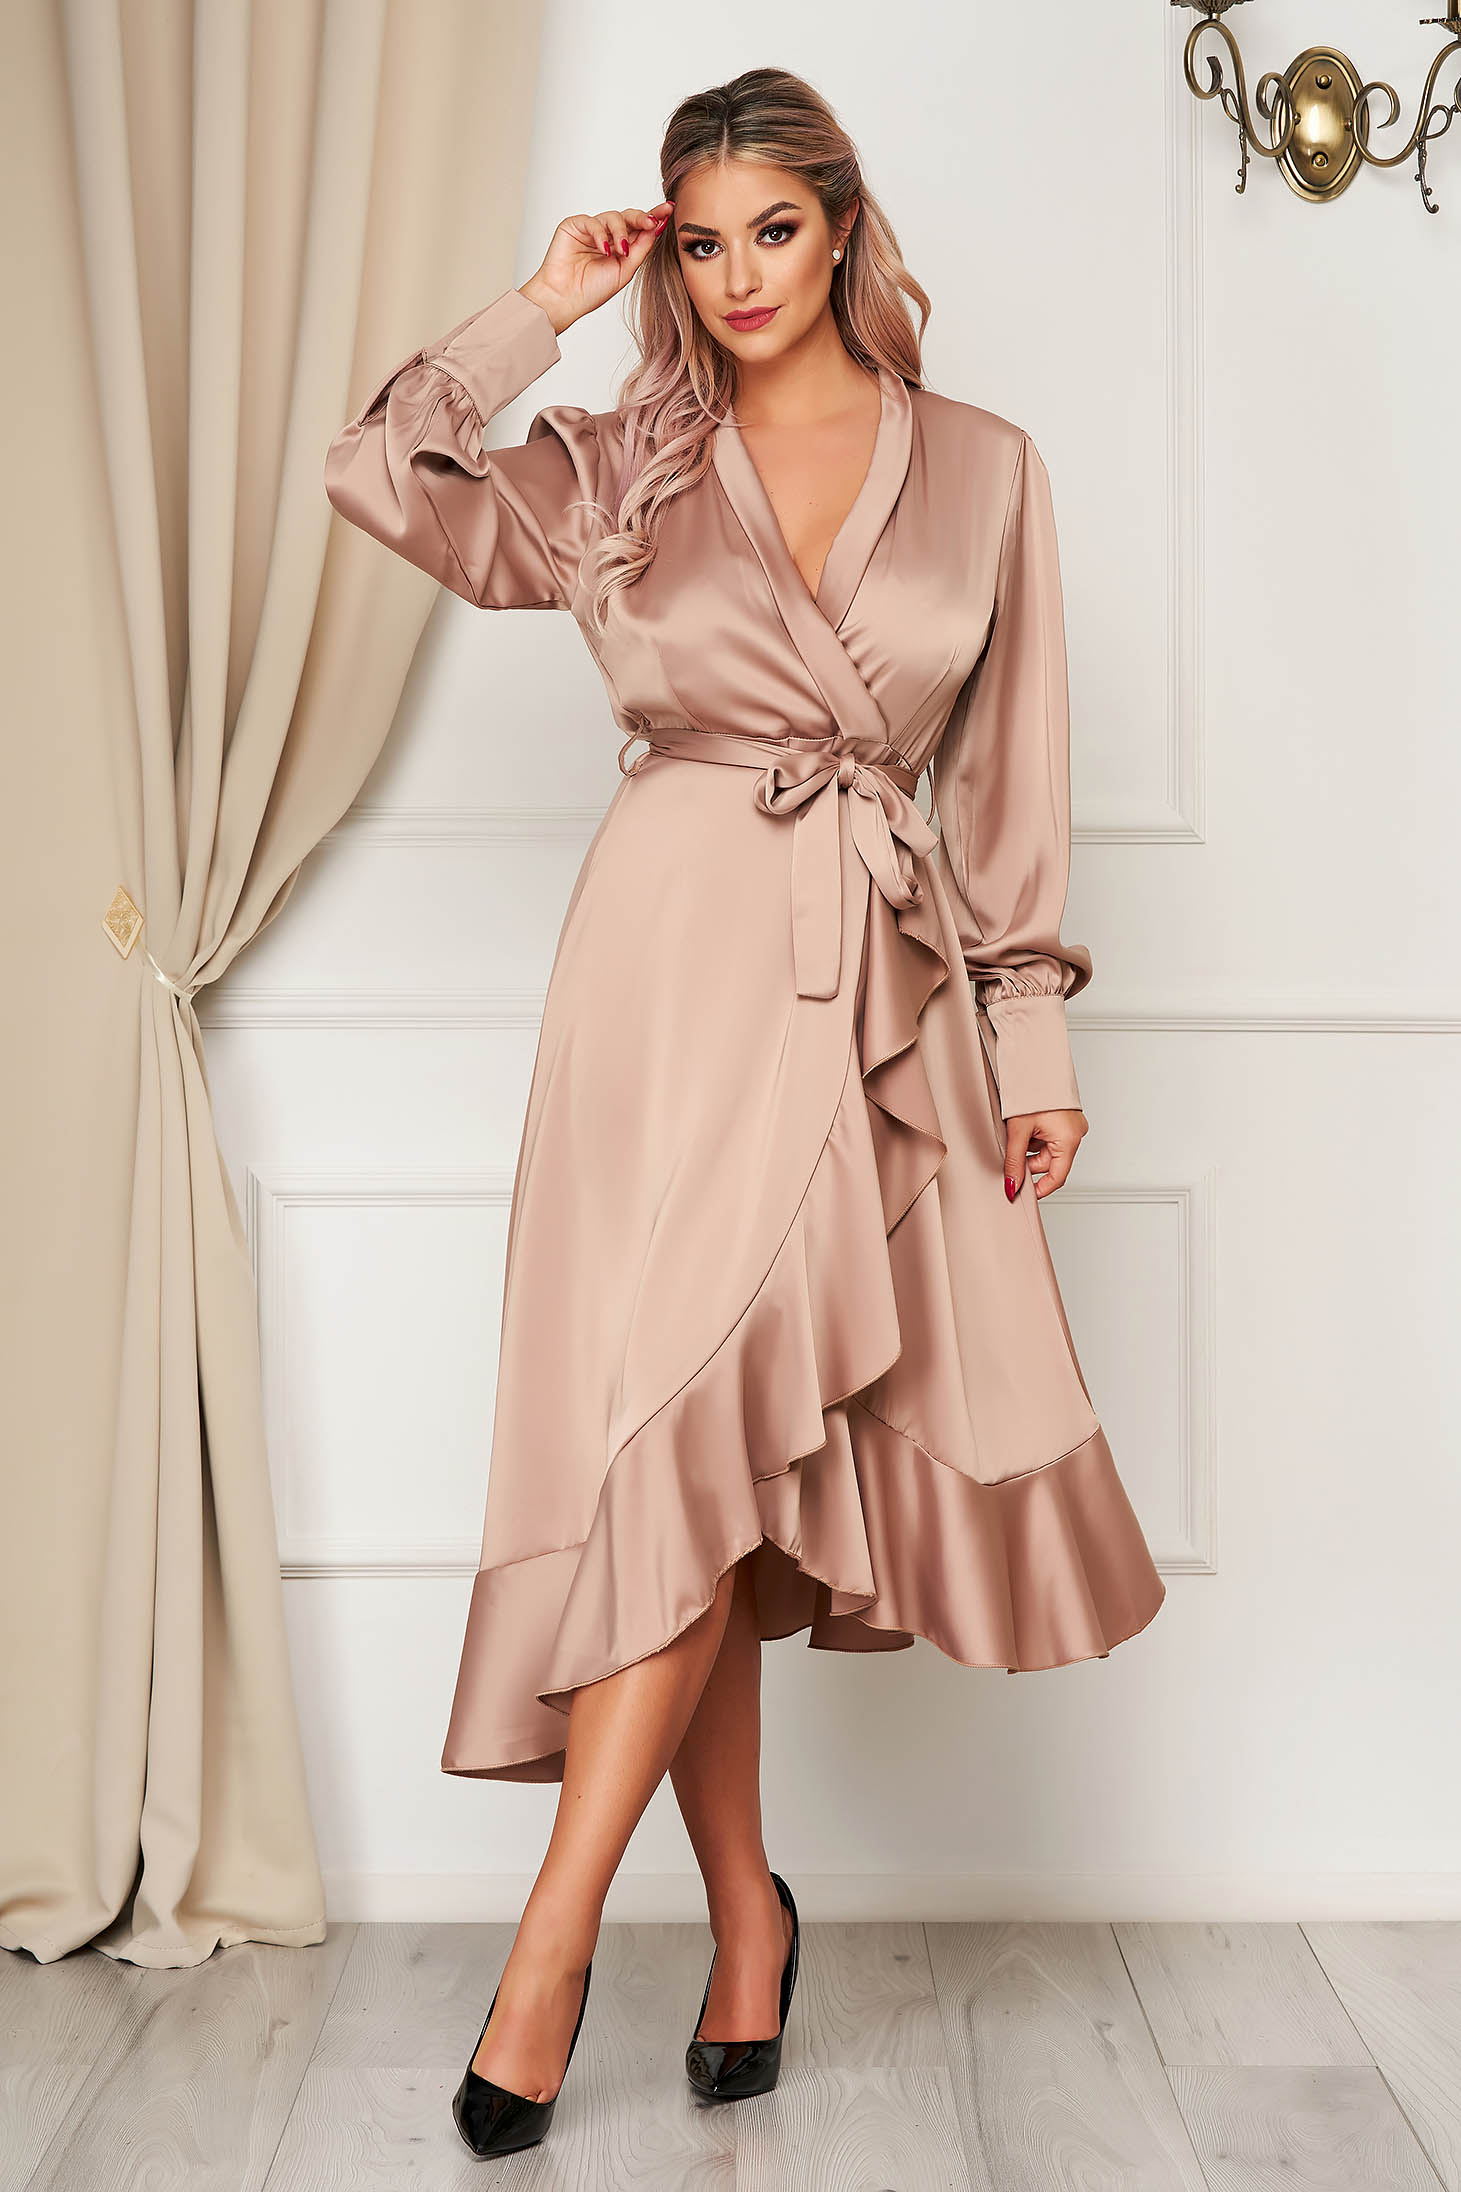 Rochie SunShine crem eleganta in clos decolteu petrecut din material satinat cu volanase la baza rochiei accesorizata cu cordon